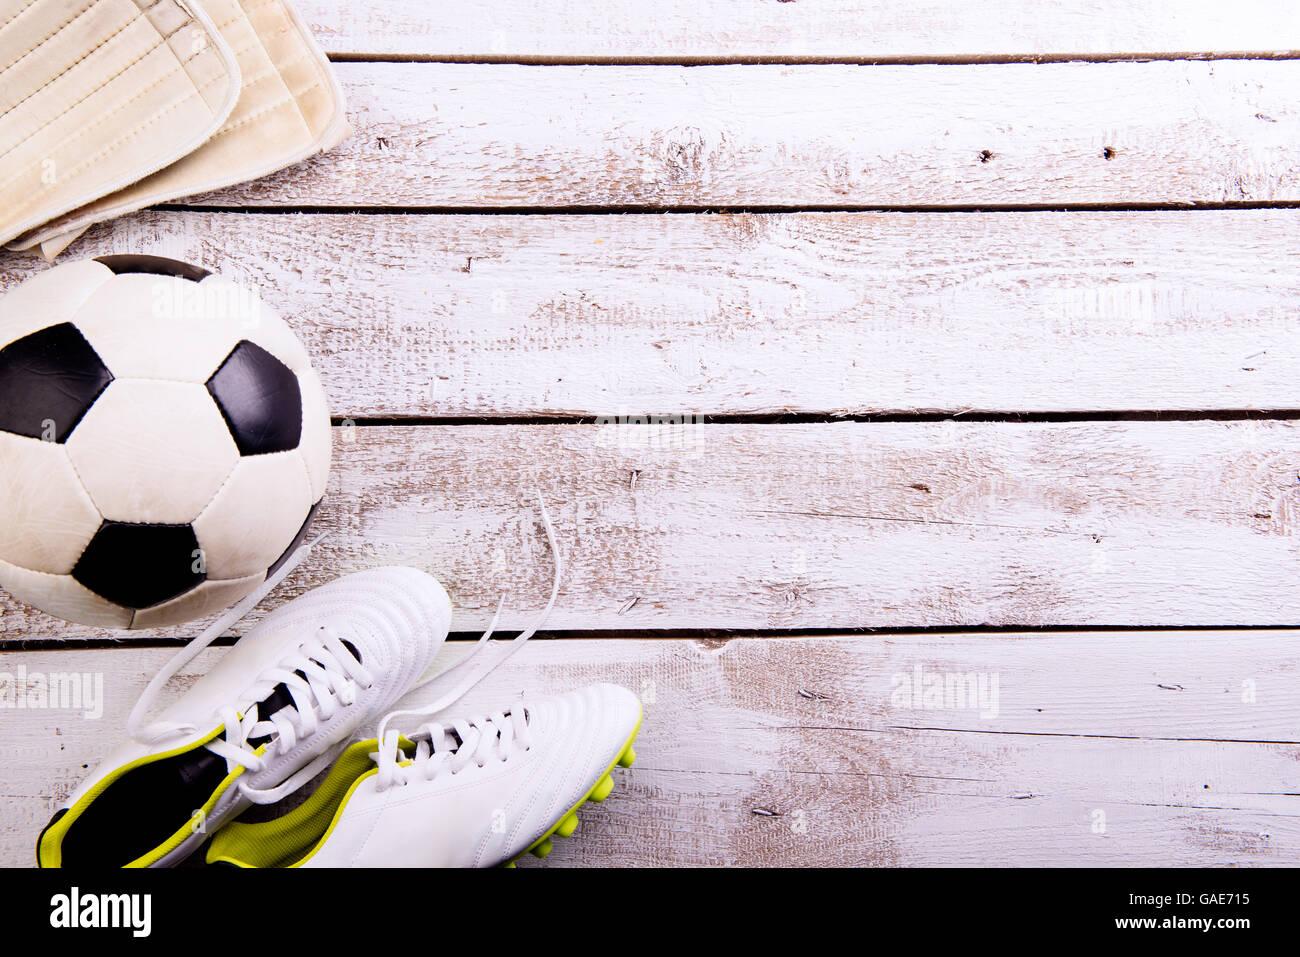 0908e7d76 Soccer ball